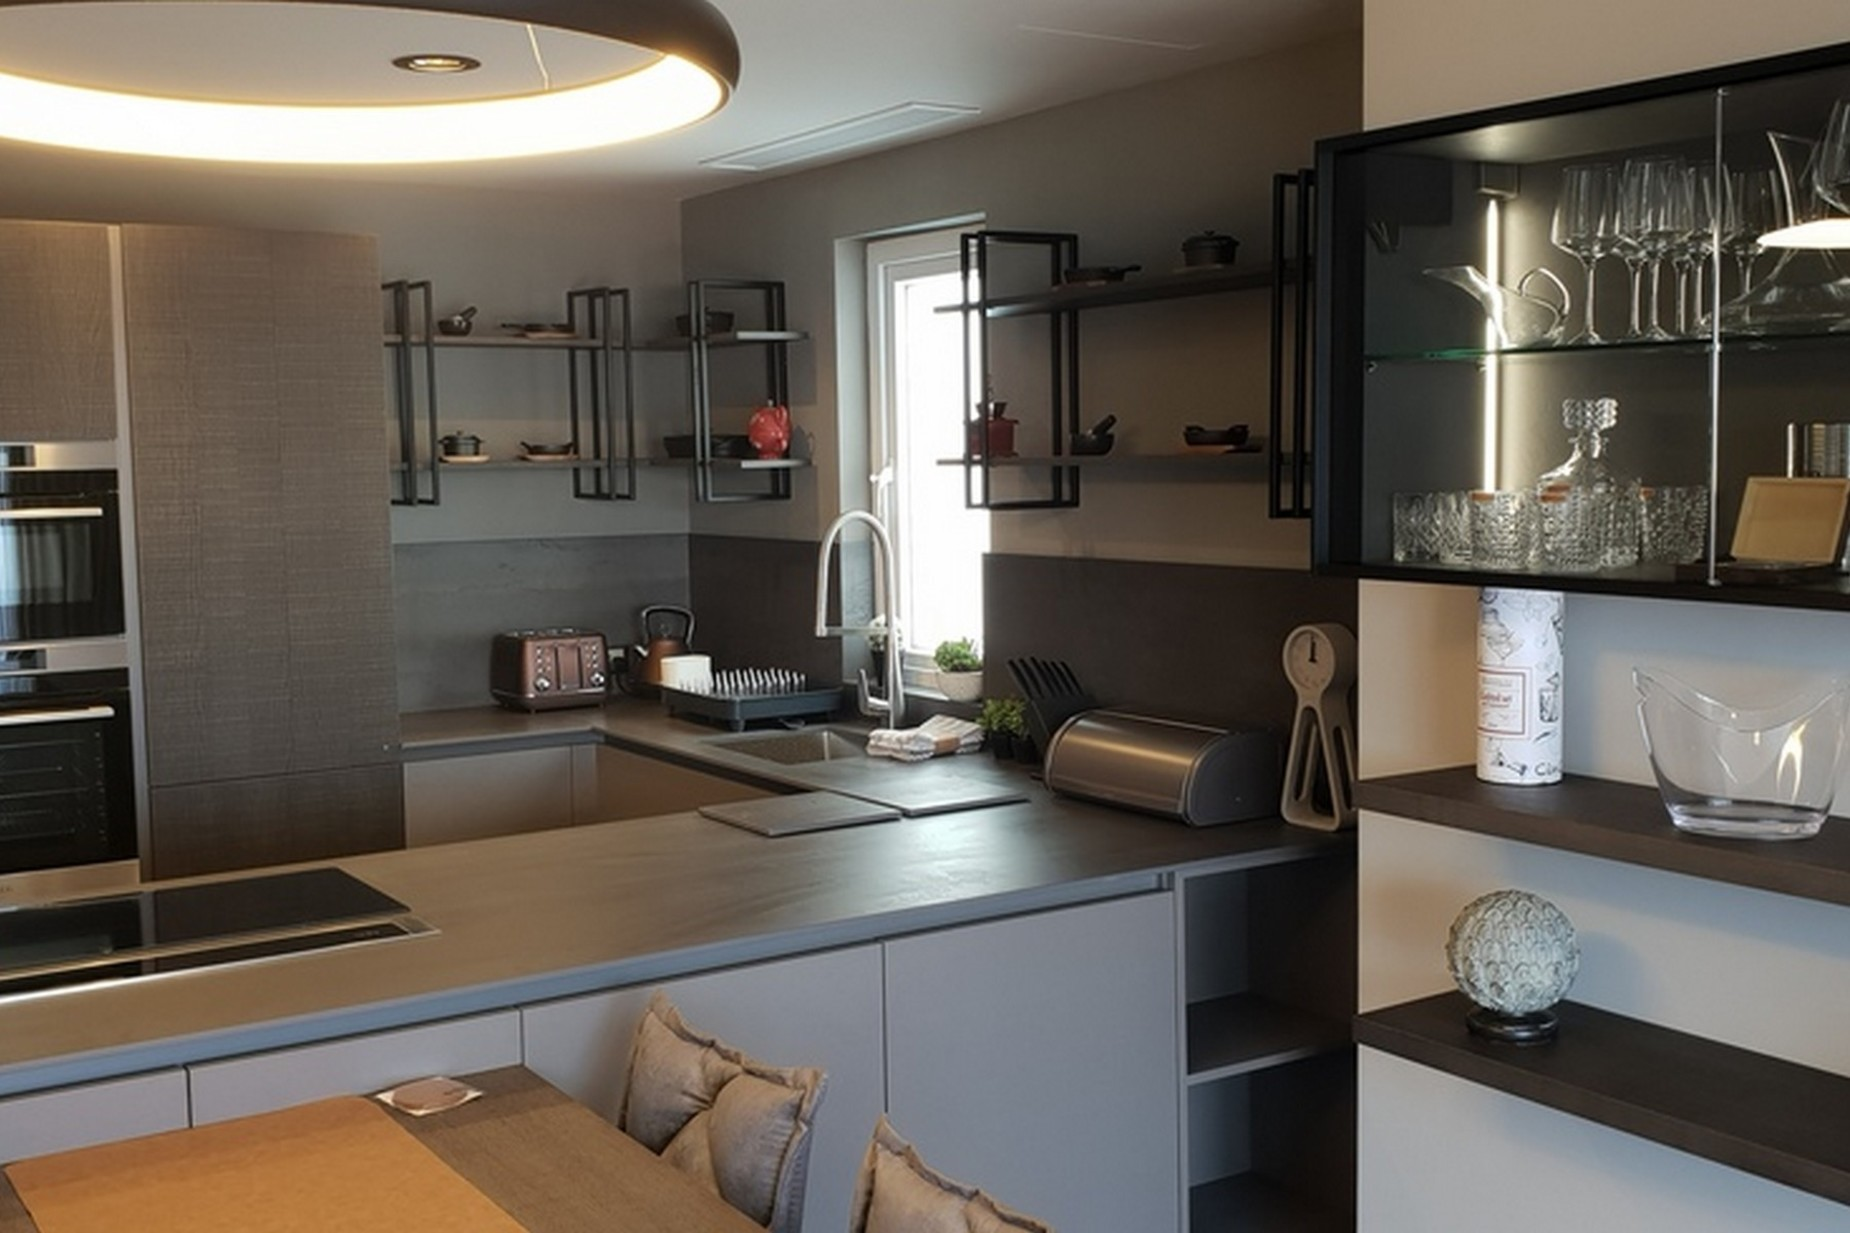 2 bed Apartment For Rent in Birkirkara, Birkirkara - thumb 8